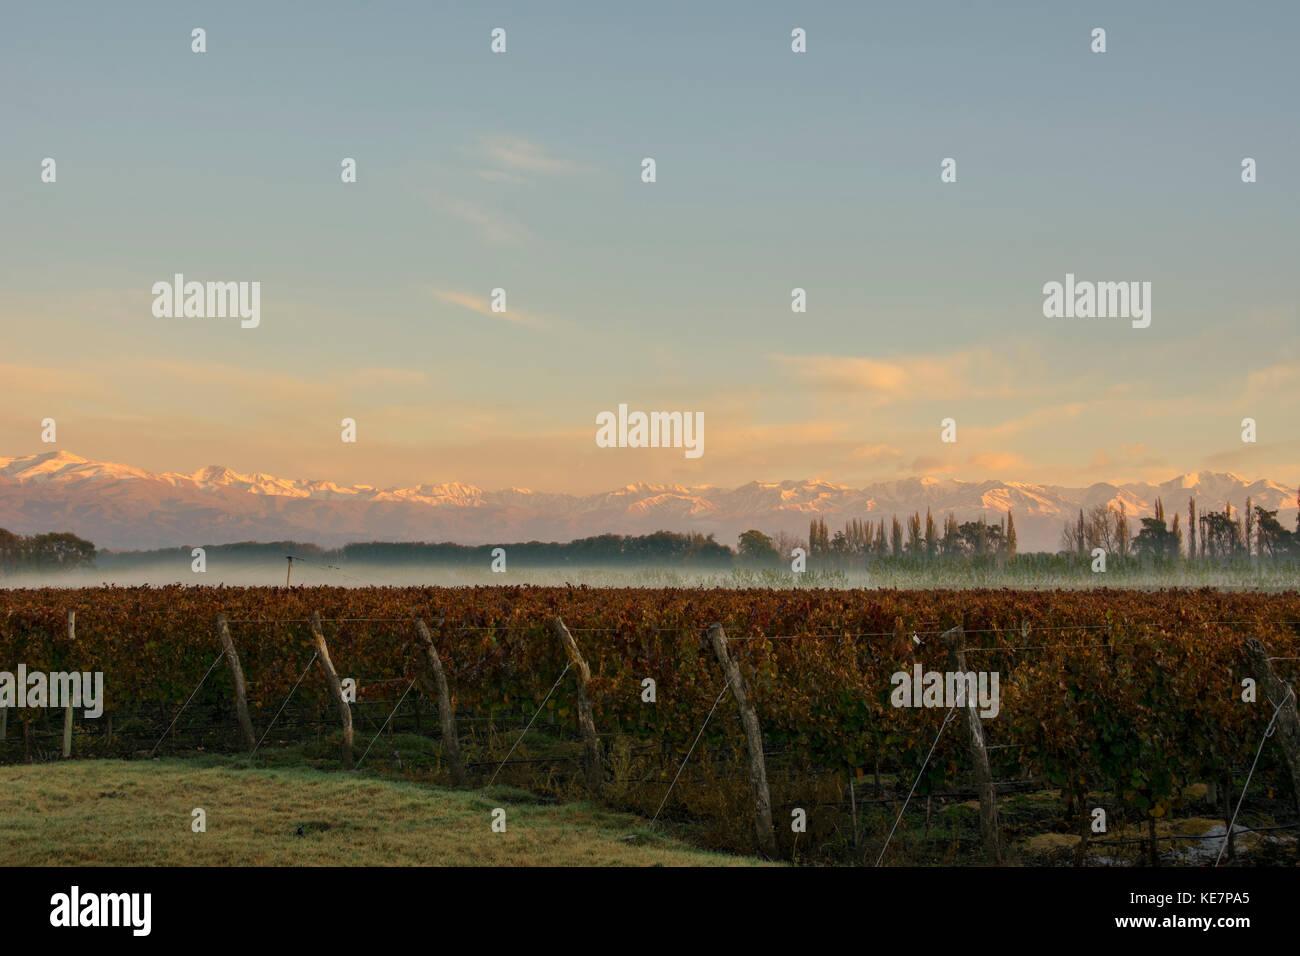 Sunrise Illuminates The Snow-Capped Mountains In The Distance While Fog Dissipates Over A Vineyard; Tunuyan, Mendoza, - Stock Image